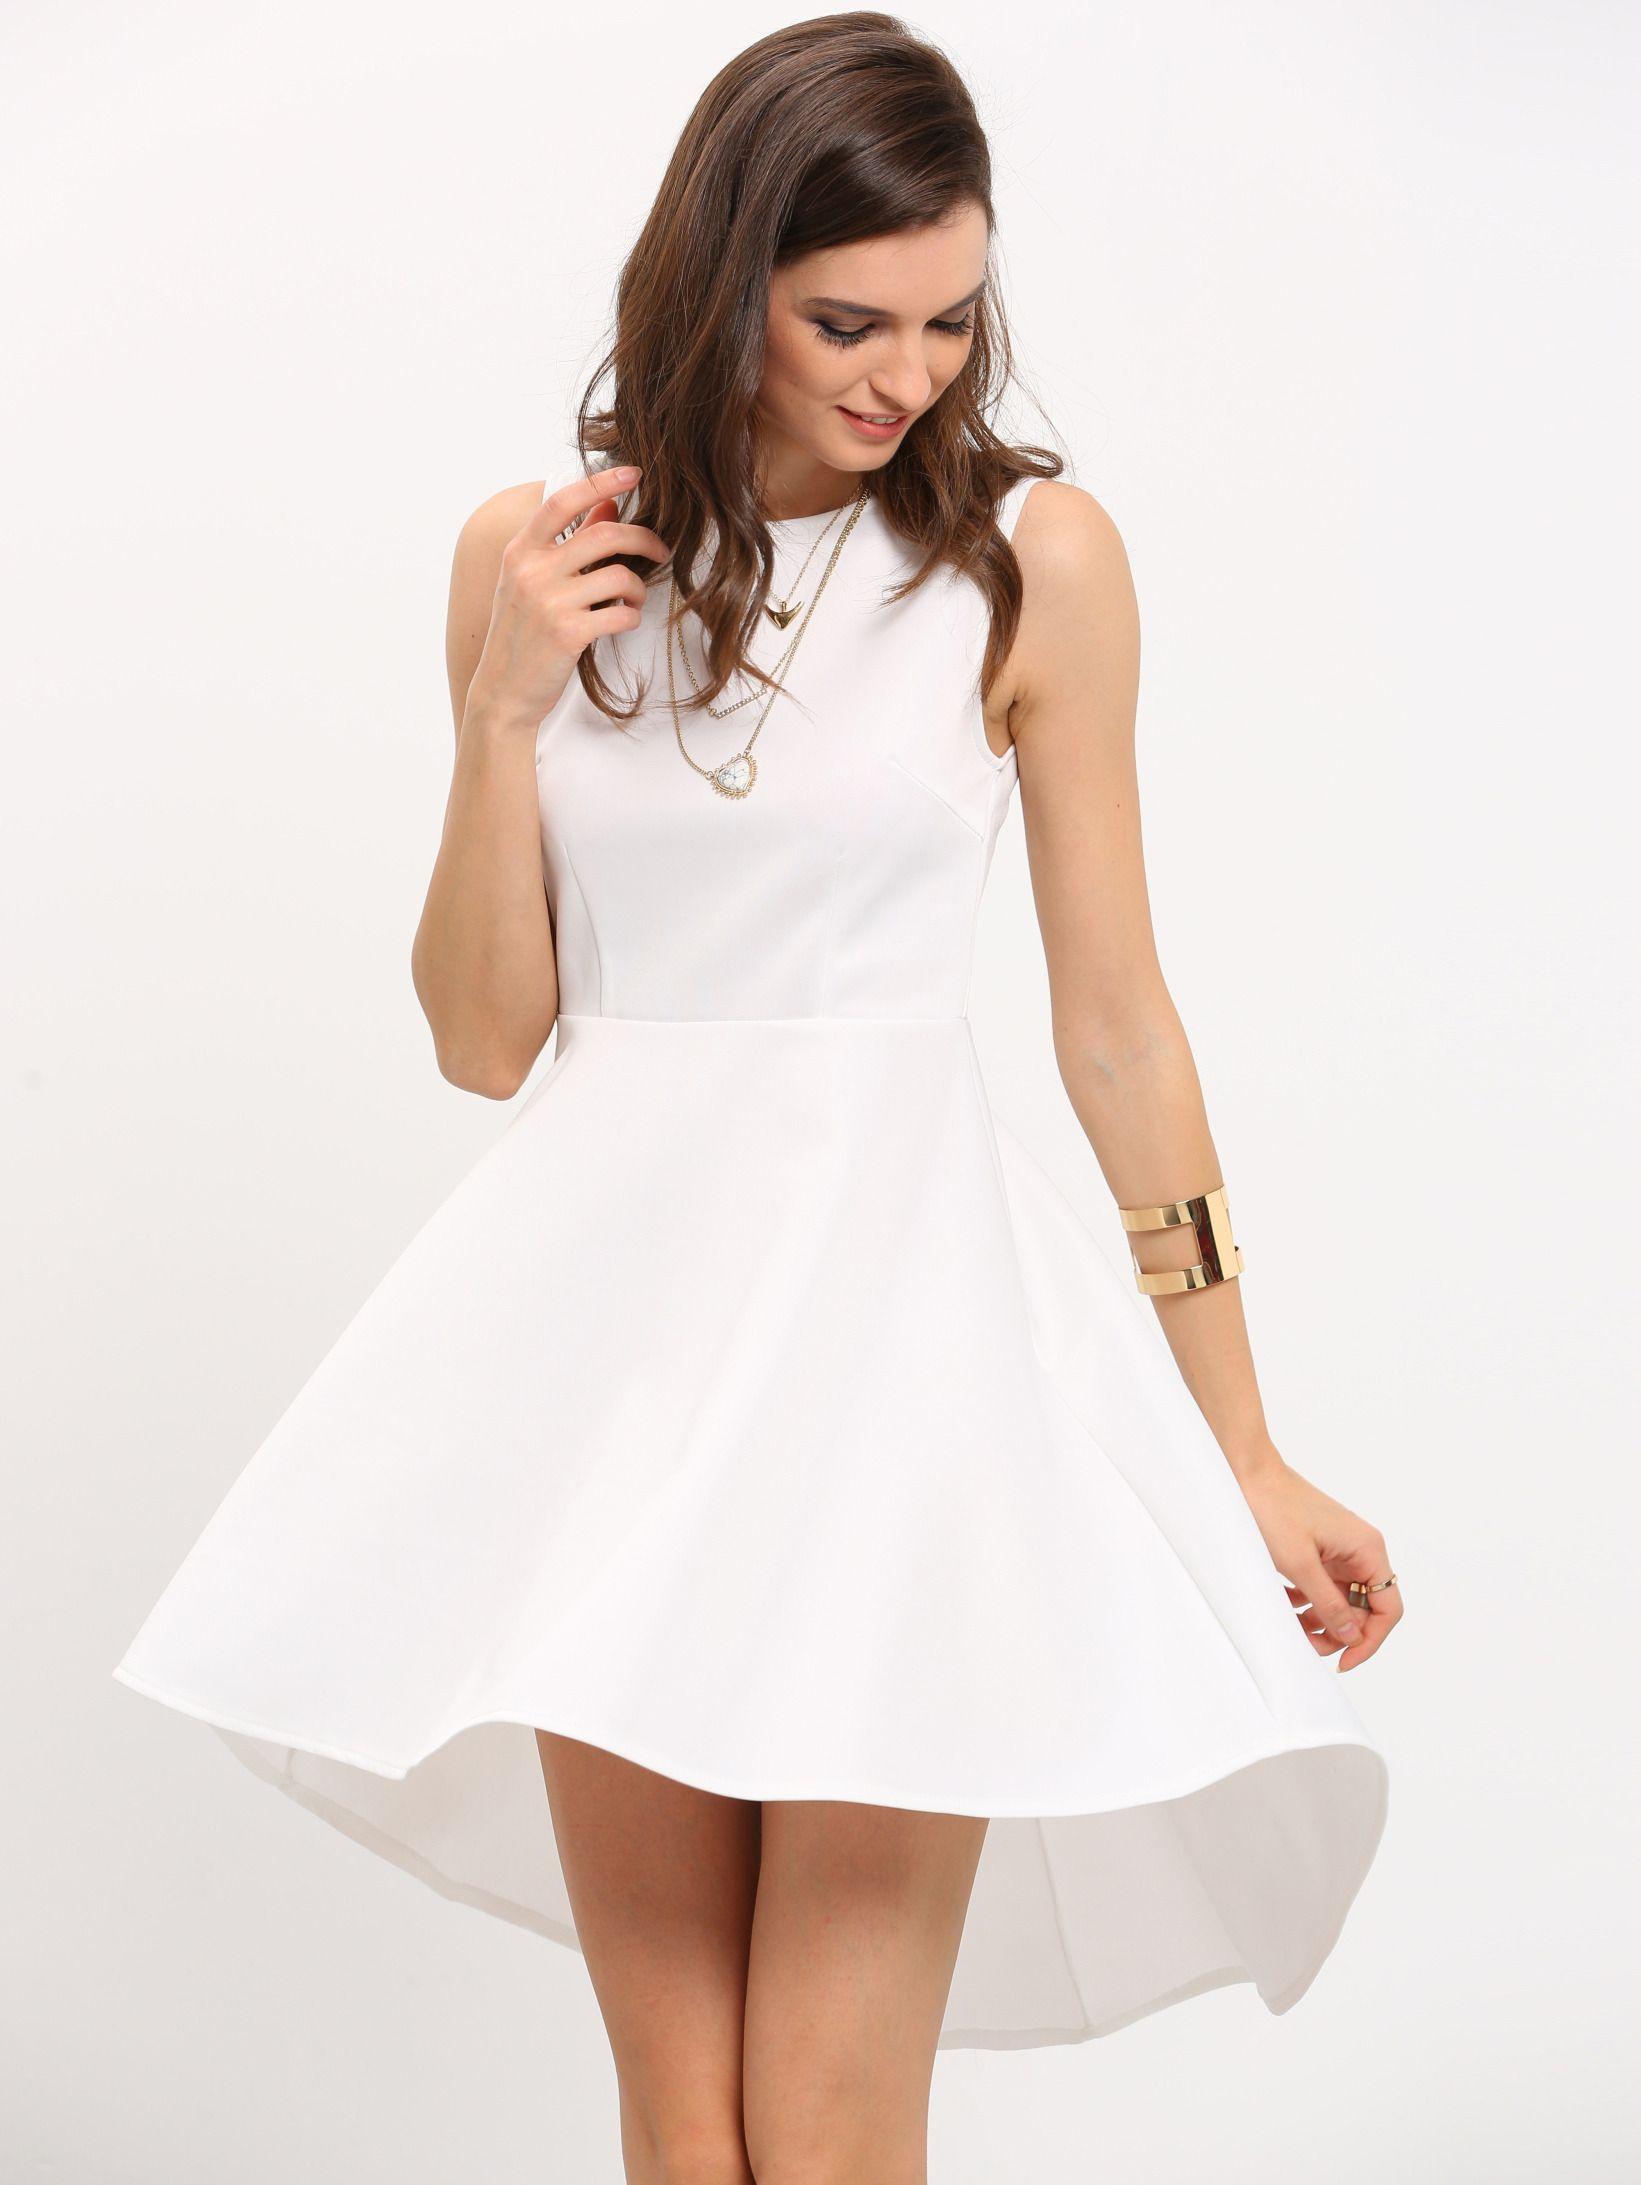 a33ebf45ad5d9 Shop White Sleeveless Asymmetric Hem Flare Dress online. SheIn offers White  Sleeveless Asymmetric Hem Flare Dress   more to fit your fashionable needs.